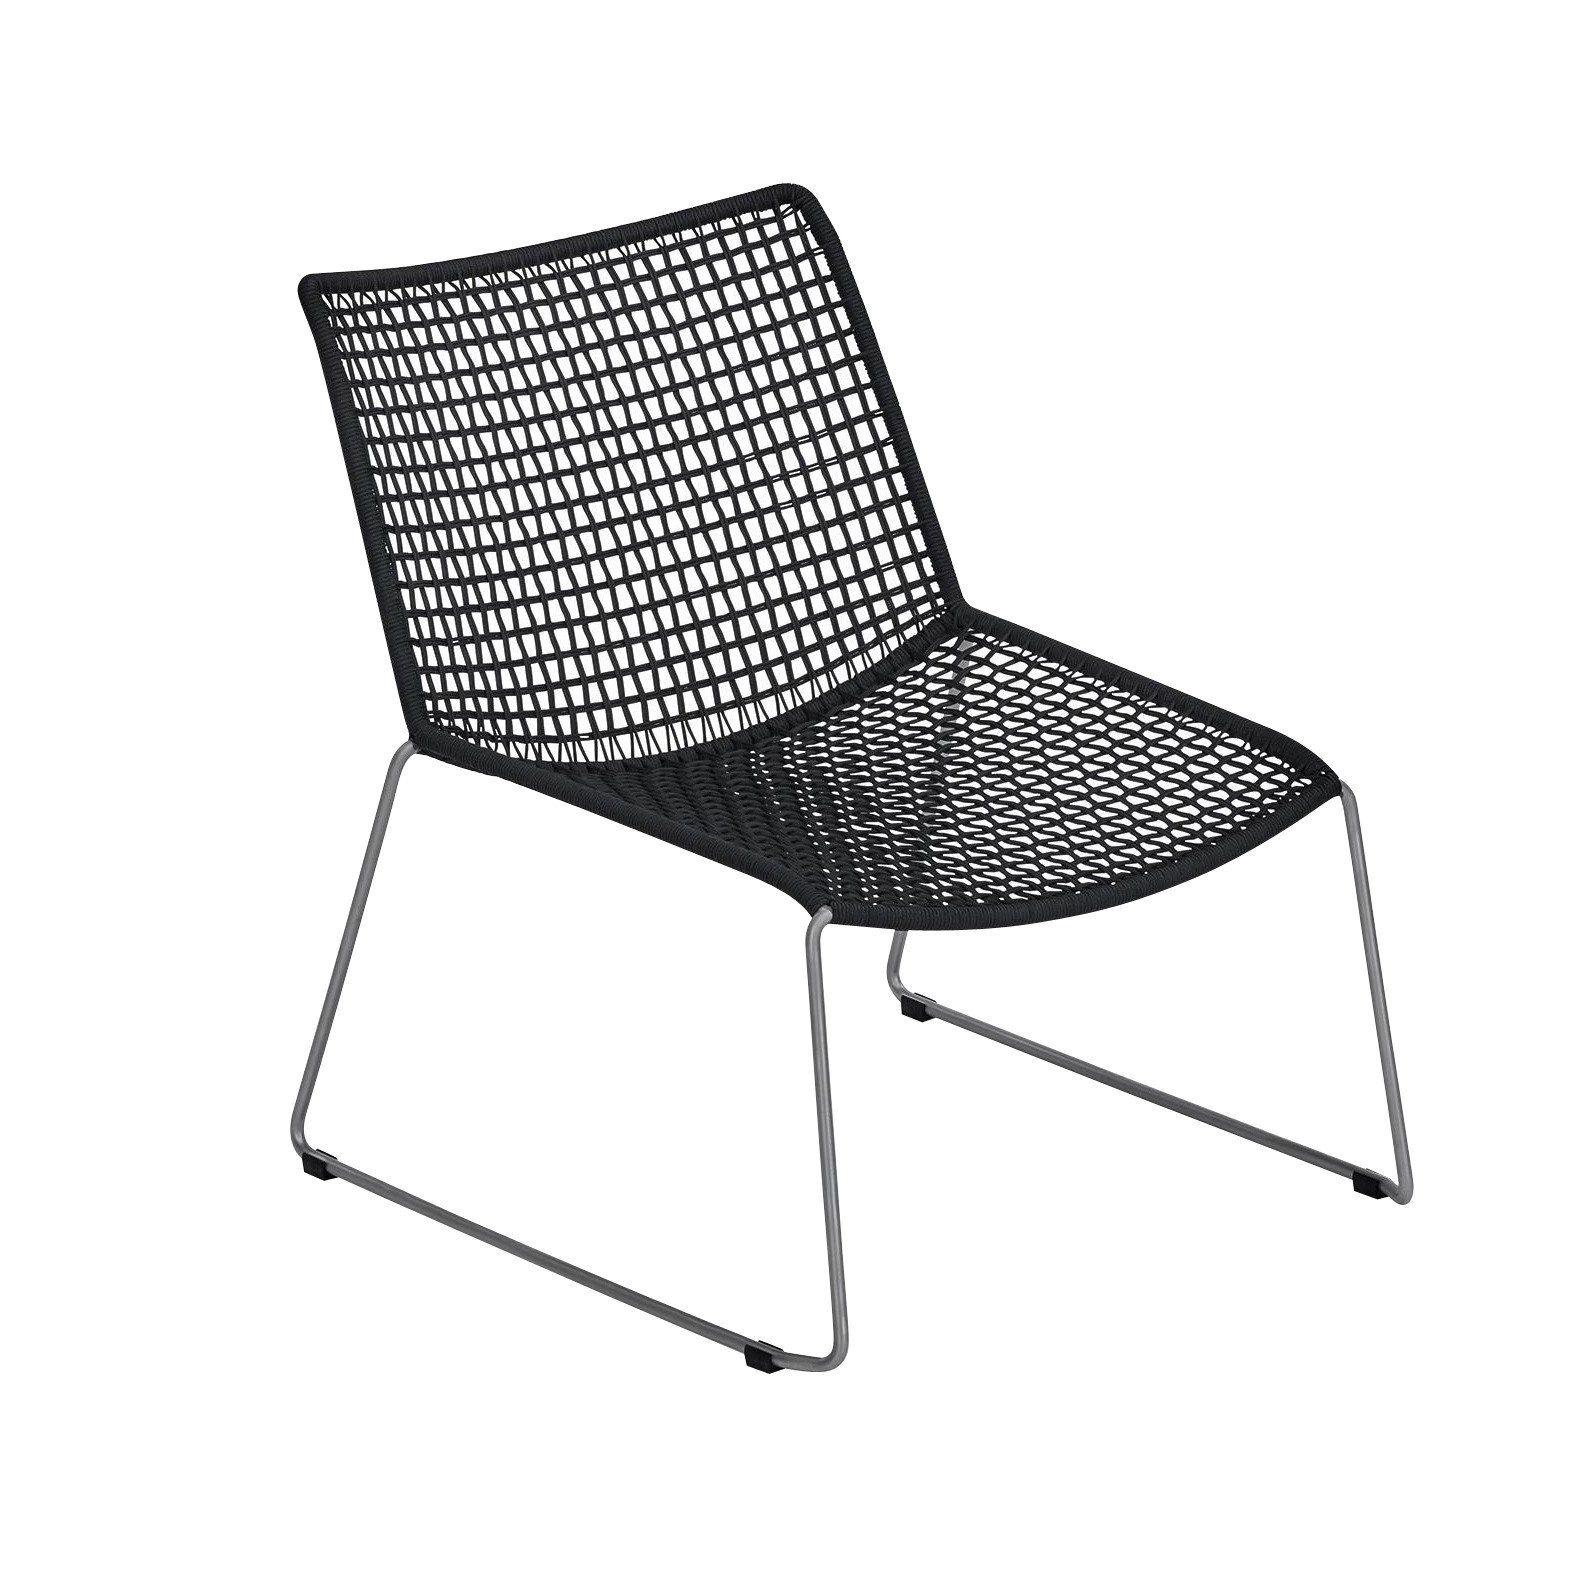 Lounge sessel schwarz weiß  Weishäupl Slope Lounge Sessel   AmbienteDirect